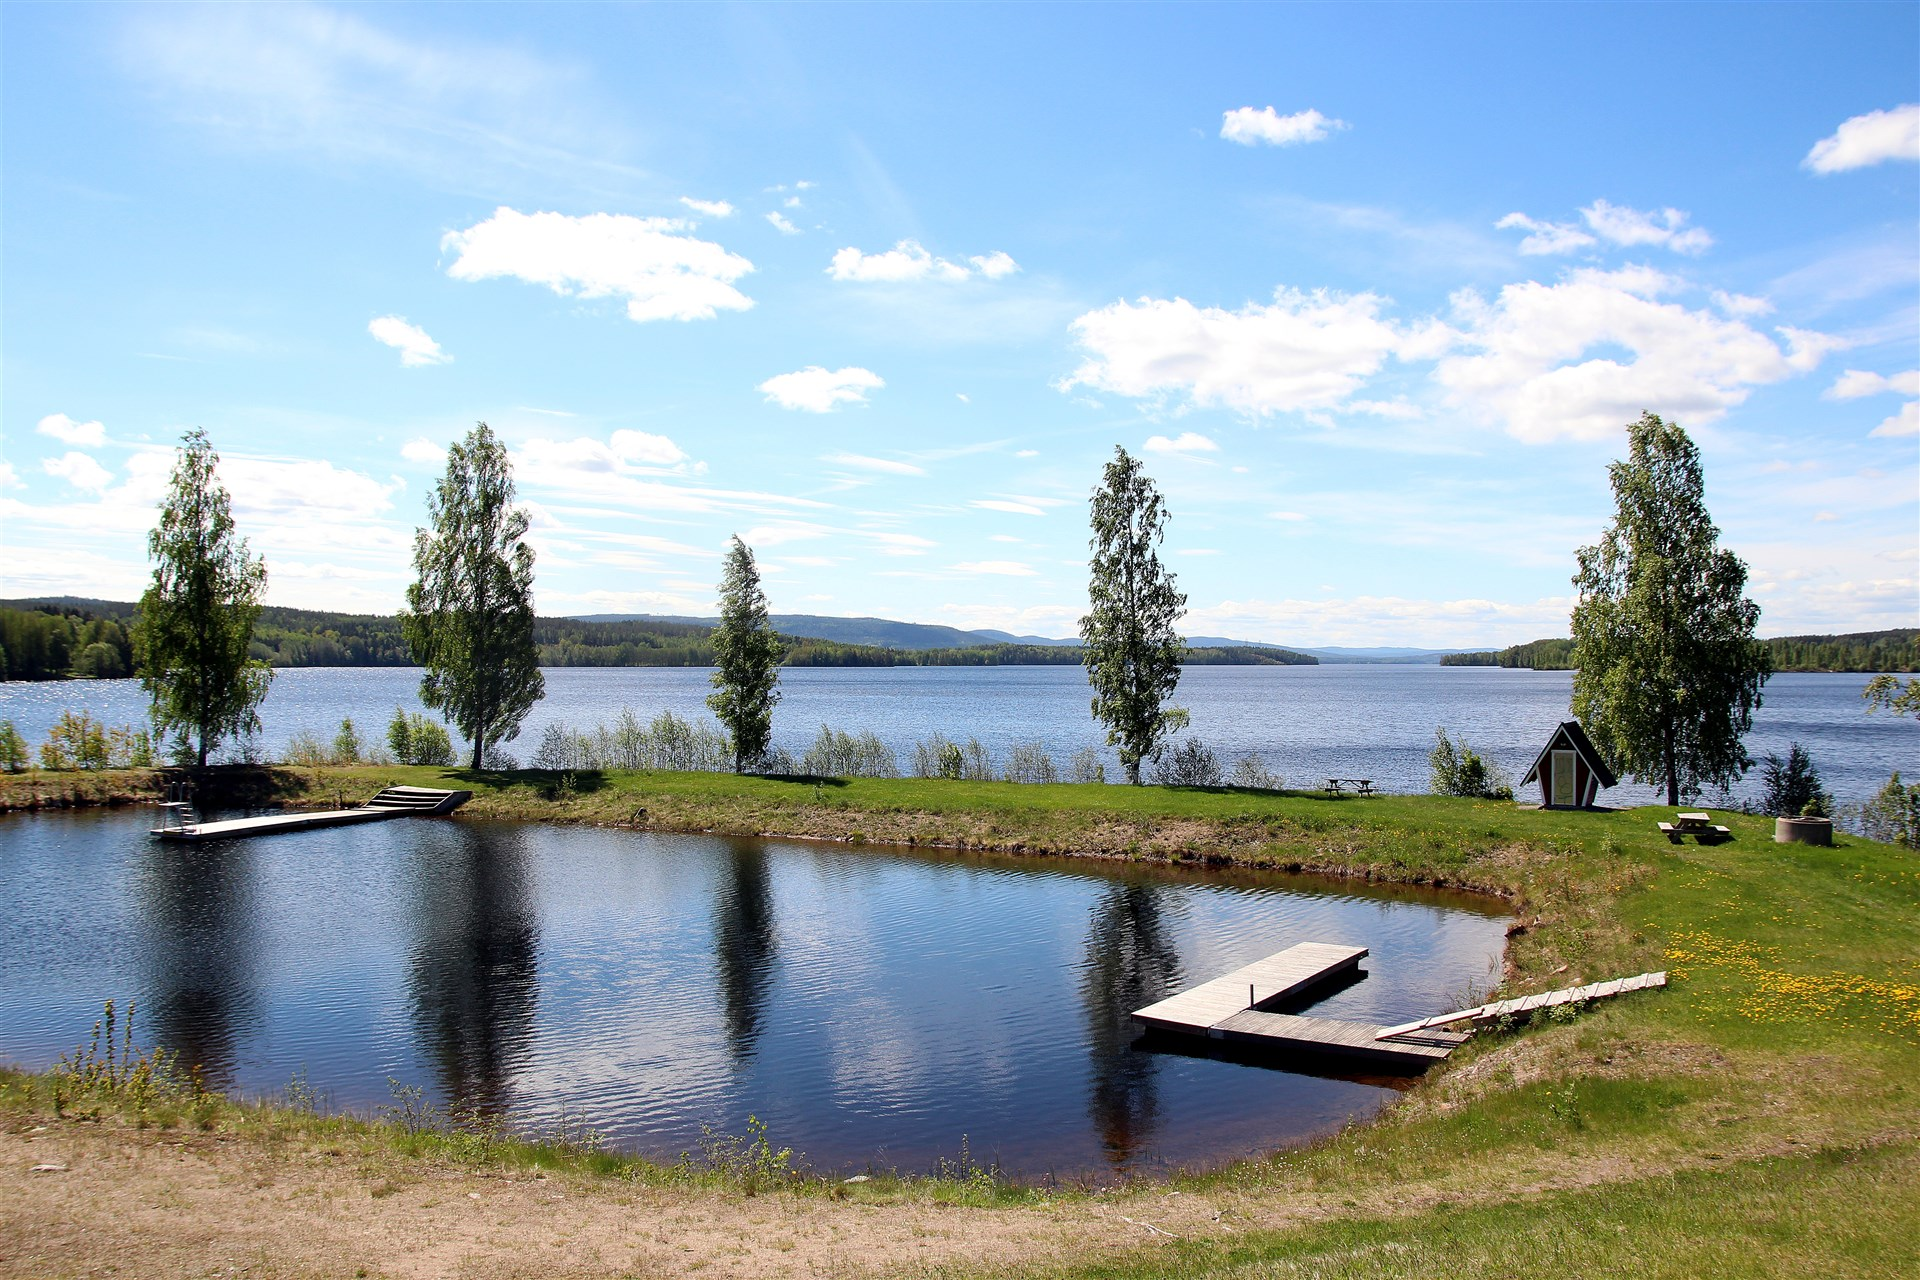 Områdesbild, Badkullen - Badplats i Bergvik